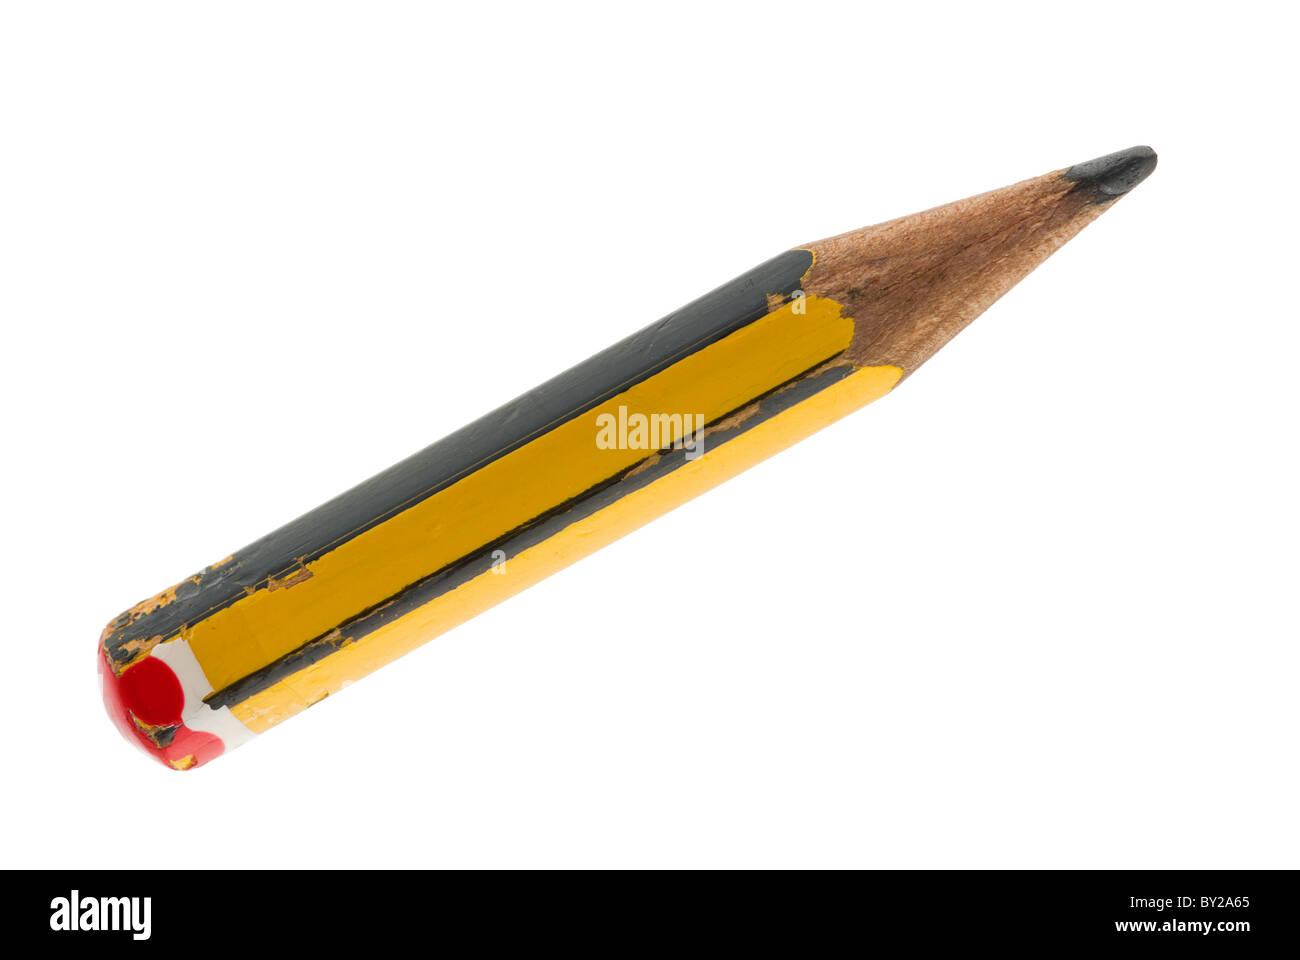 Small Pencil - 2011 - Stock Image